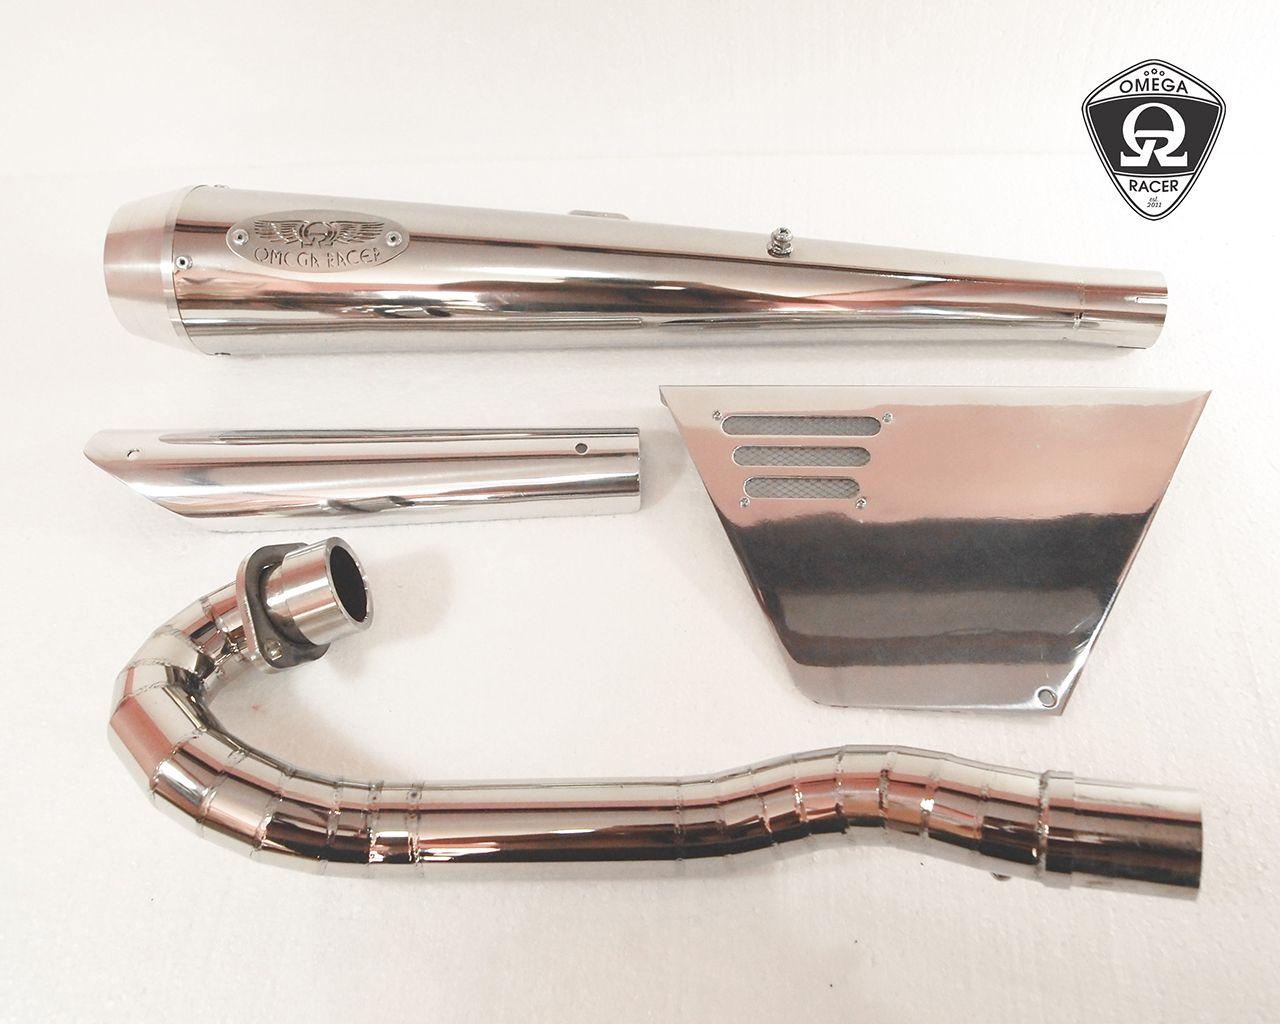 【OMEGA RACER】Scrambler 全段排氣管 - 「Webike-摩托百貨」